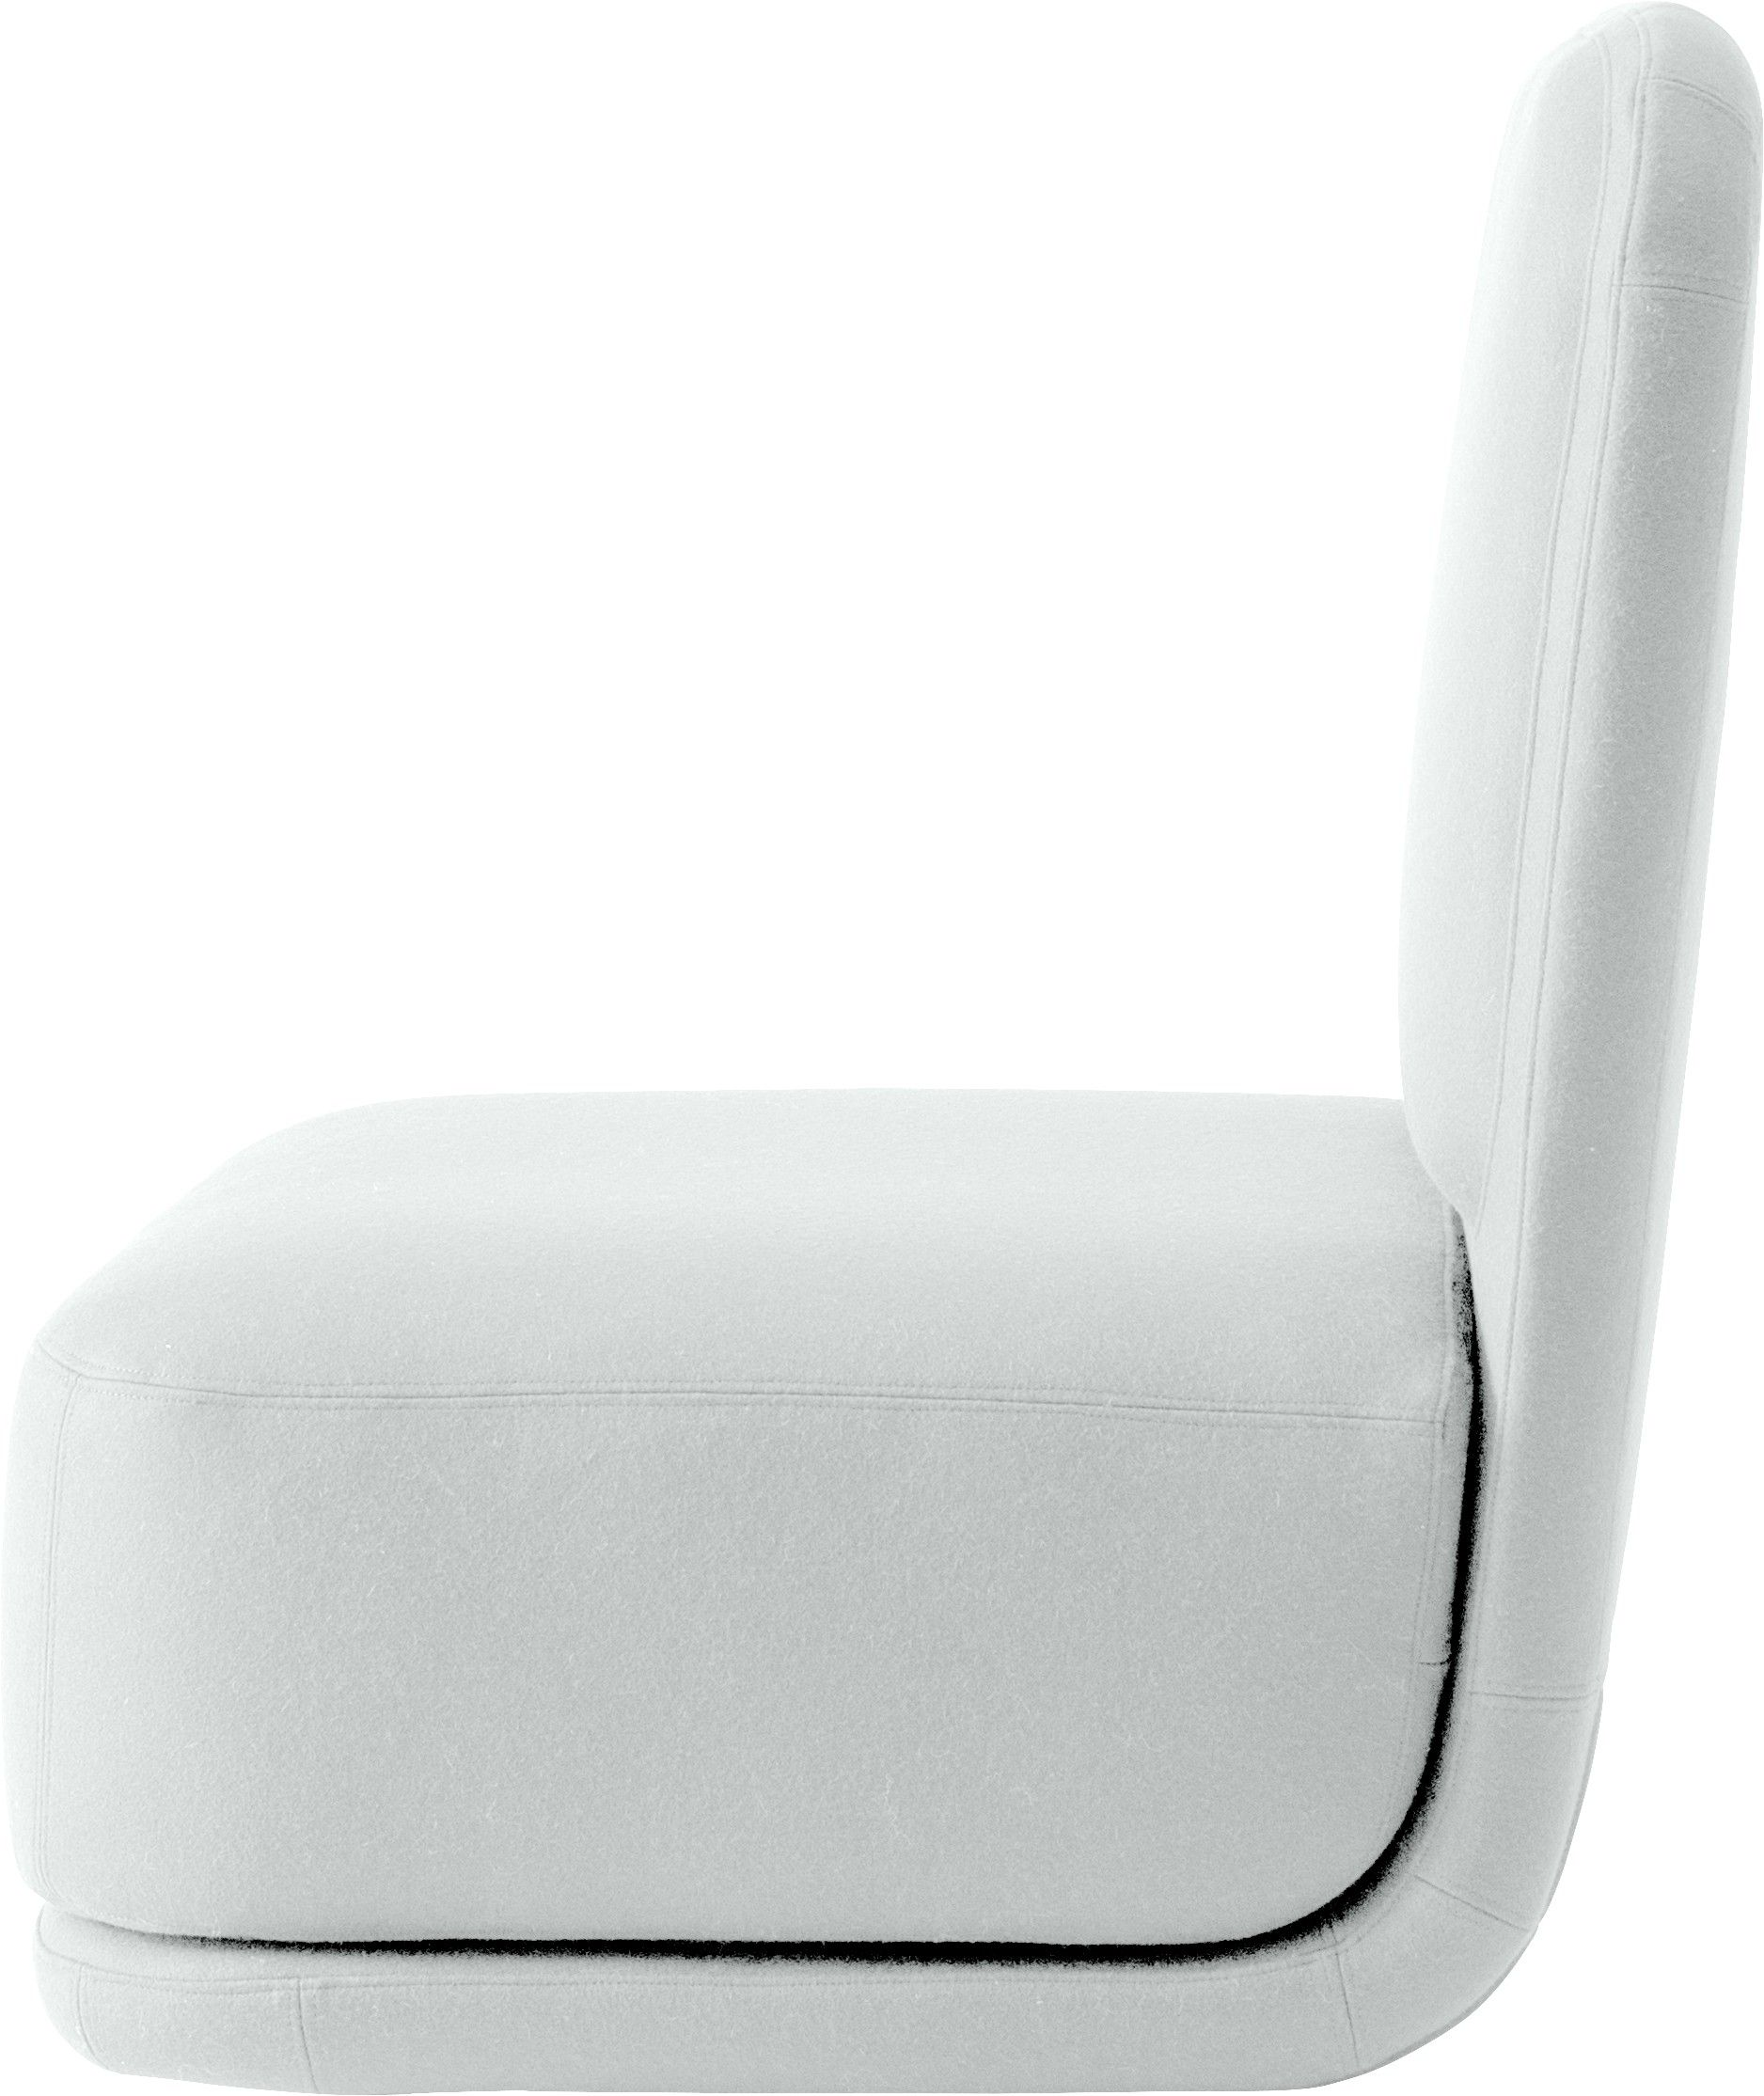 Standby Sessel Hoch Produktneuheiten Lounge Sessel Sessel Und